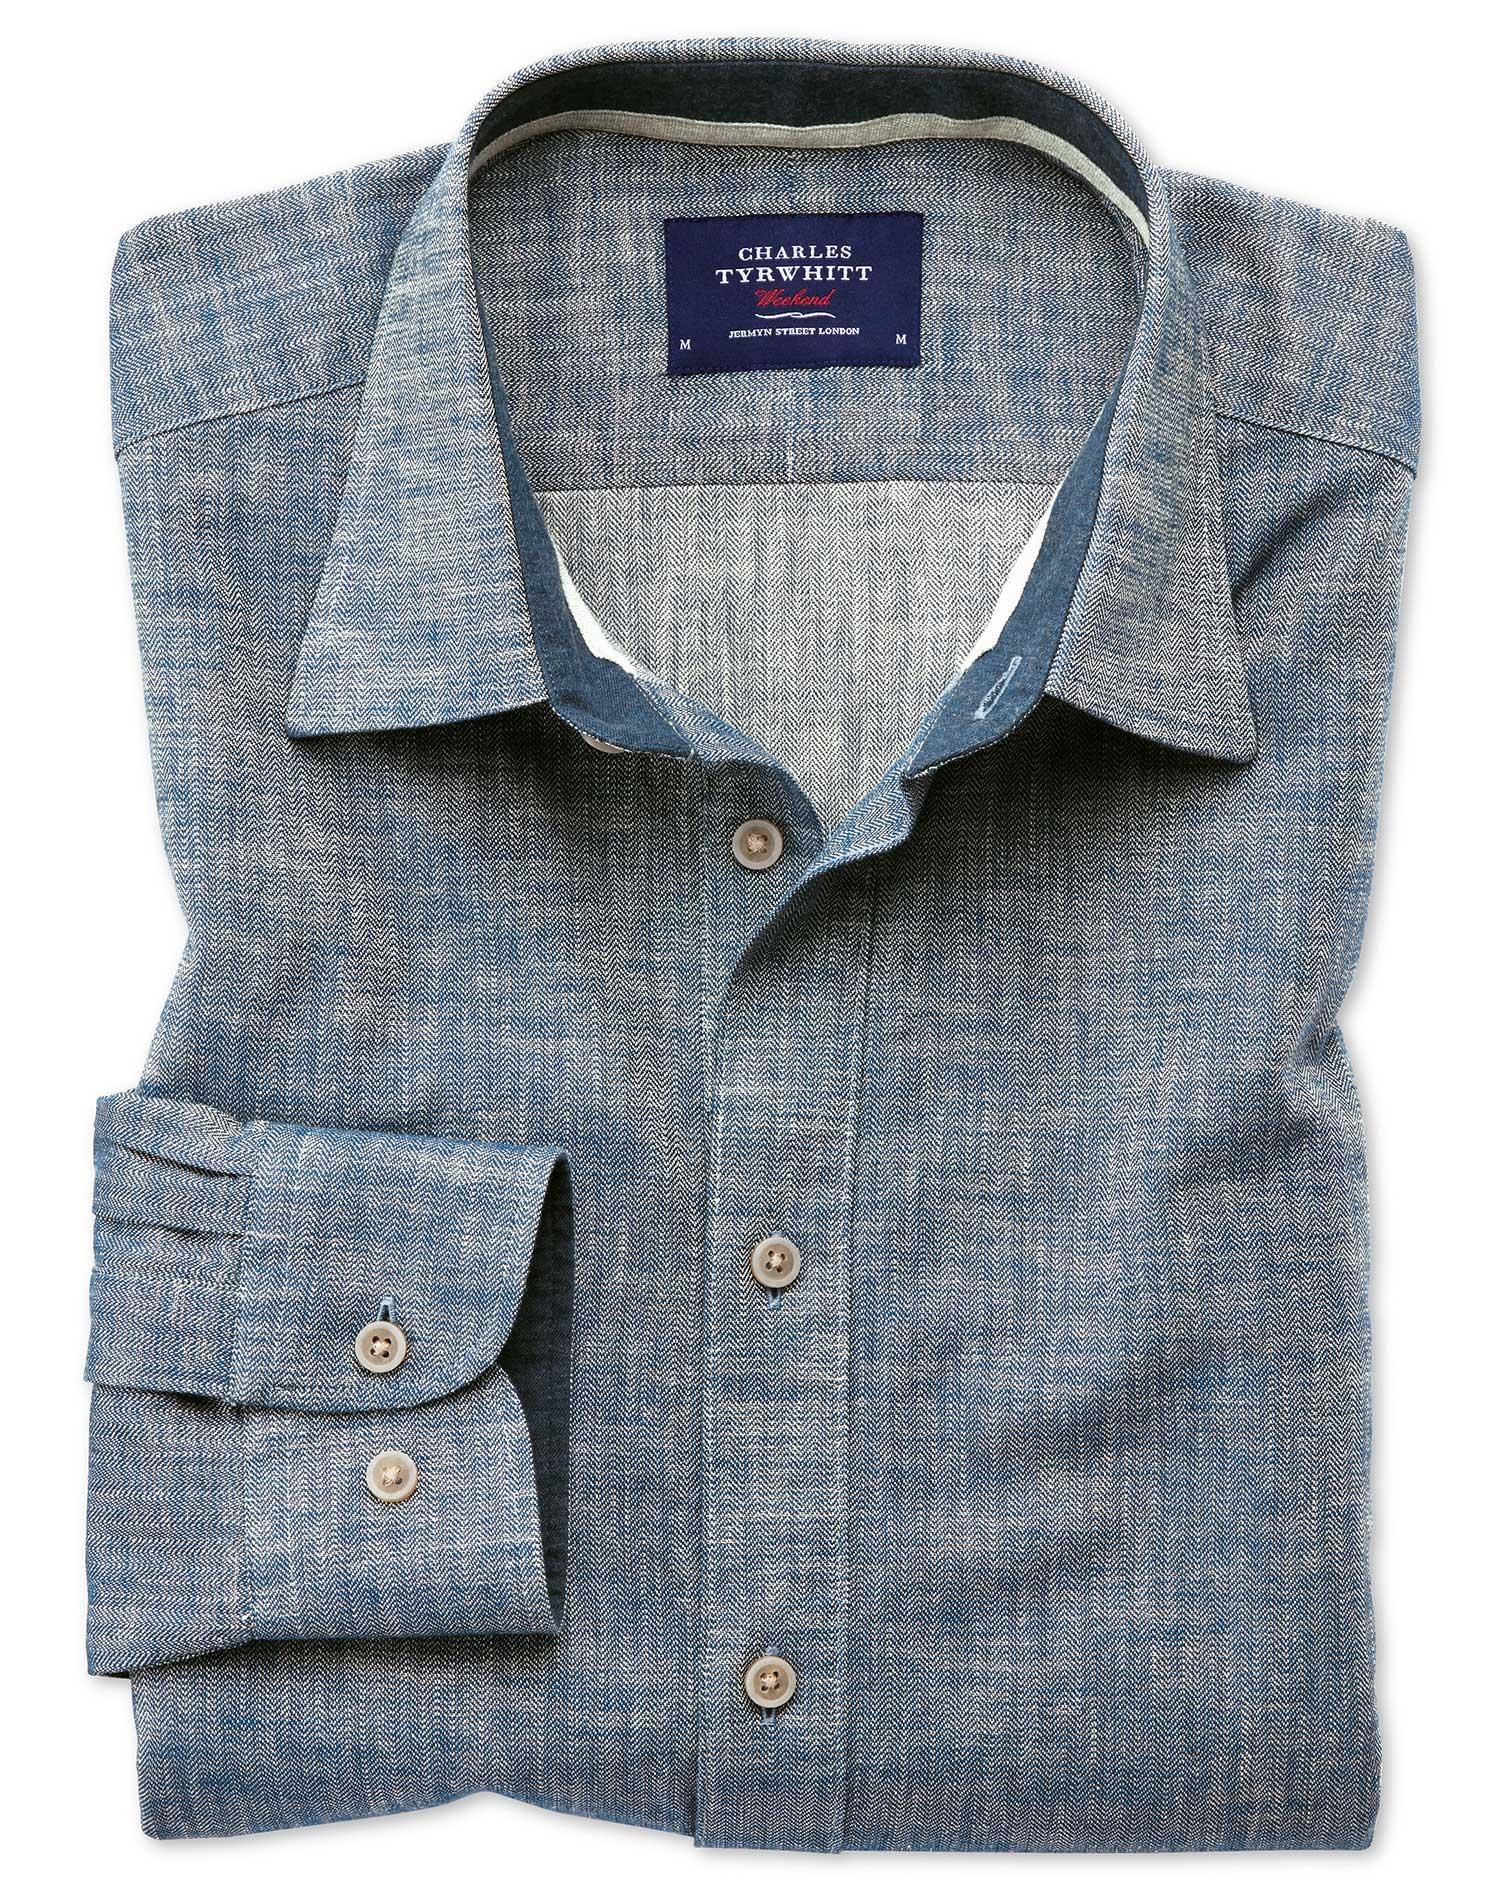 Classic Fit Popover Herringbone Denim Blue Cotton Shirt Single Cuff Size XL by Charles Tyrwhitt